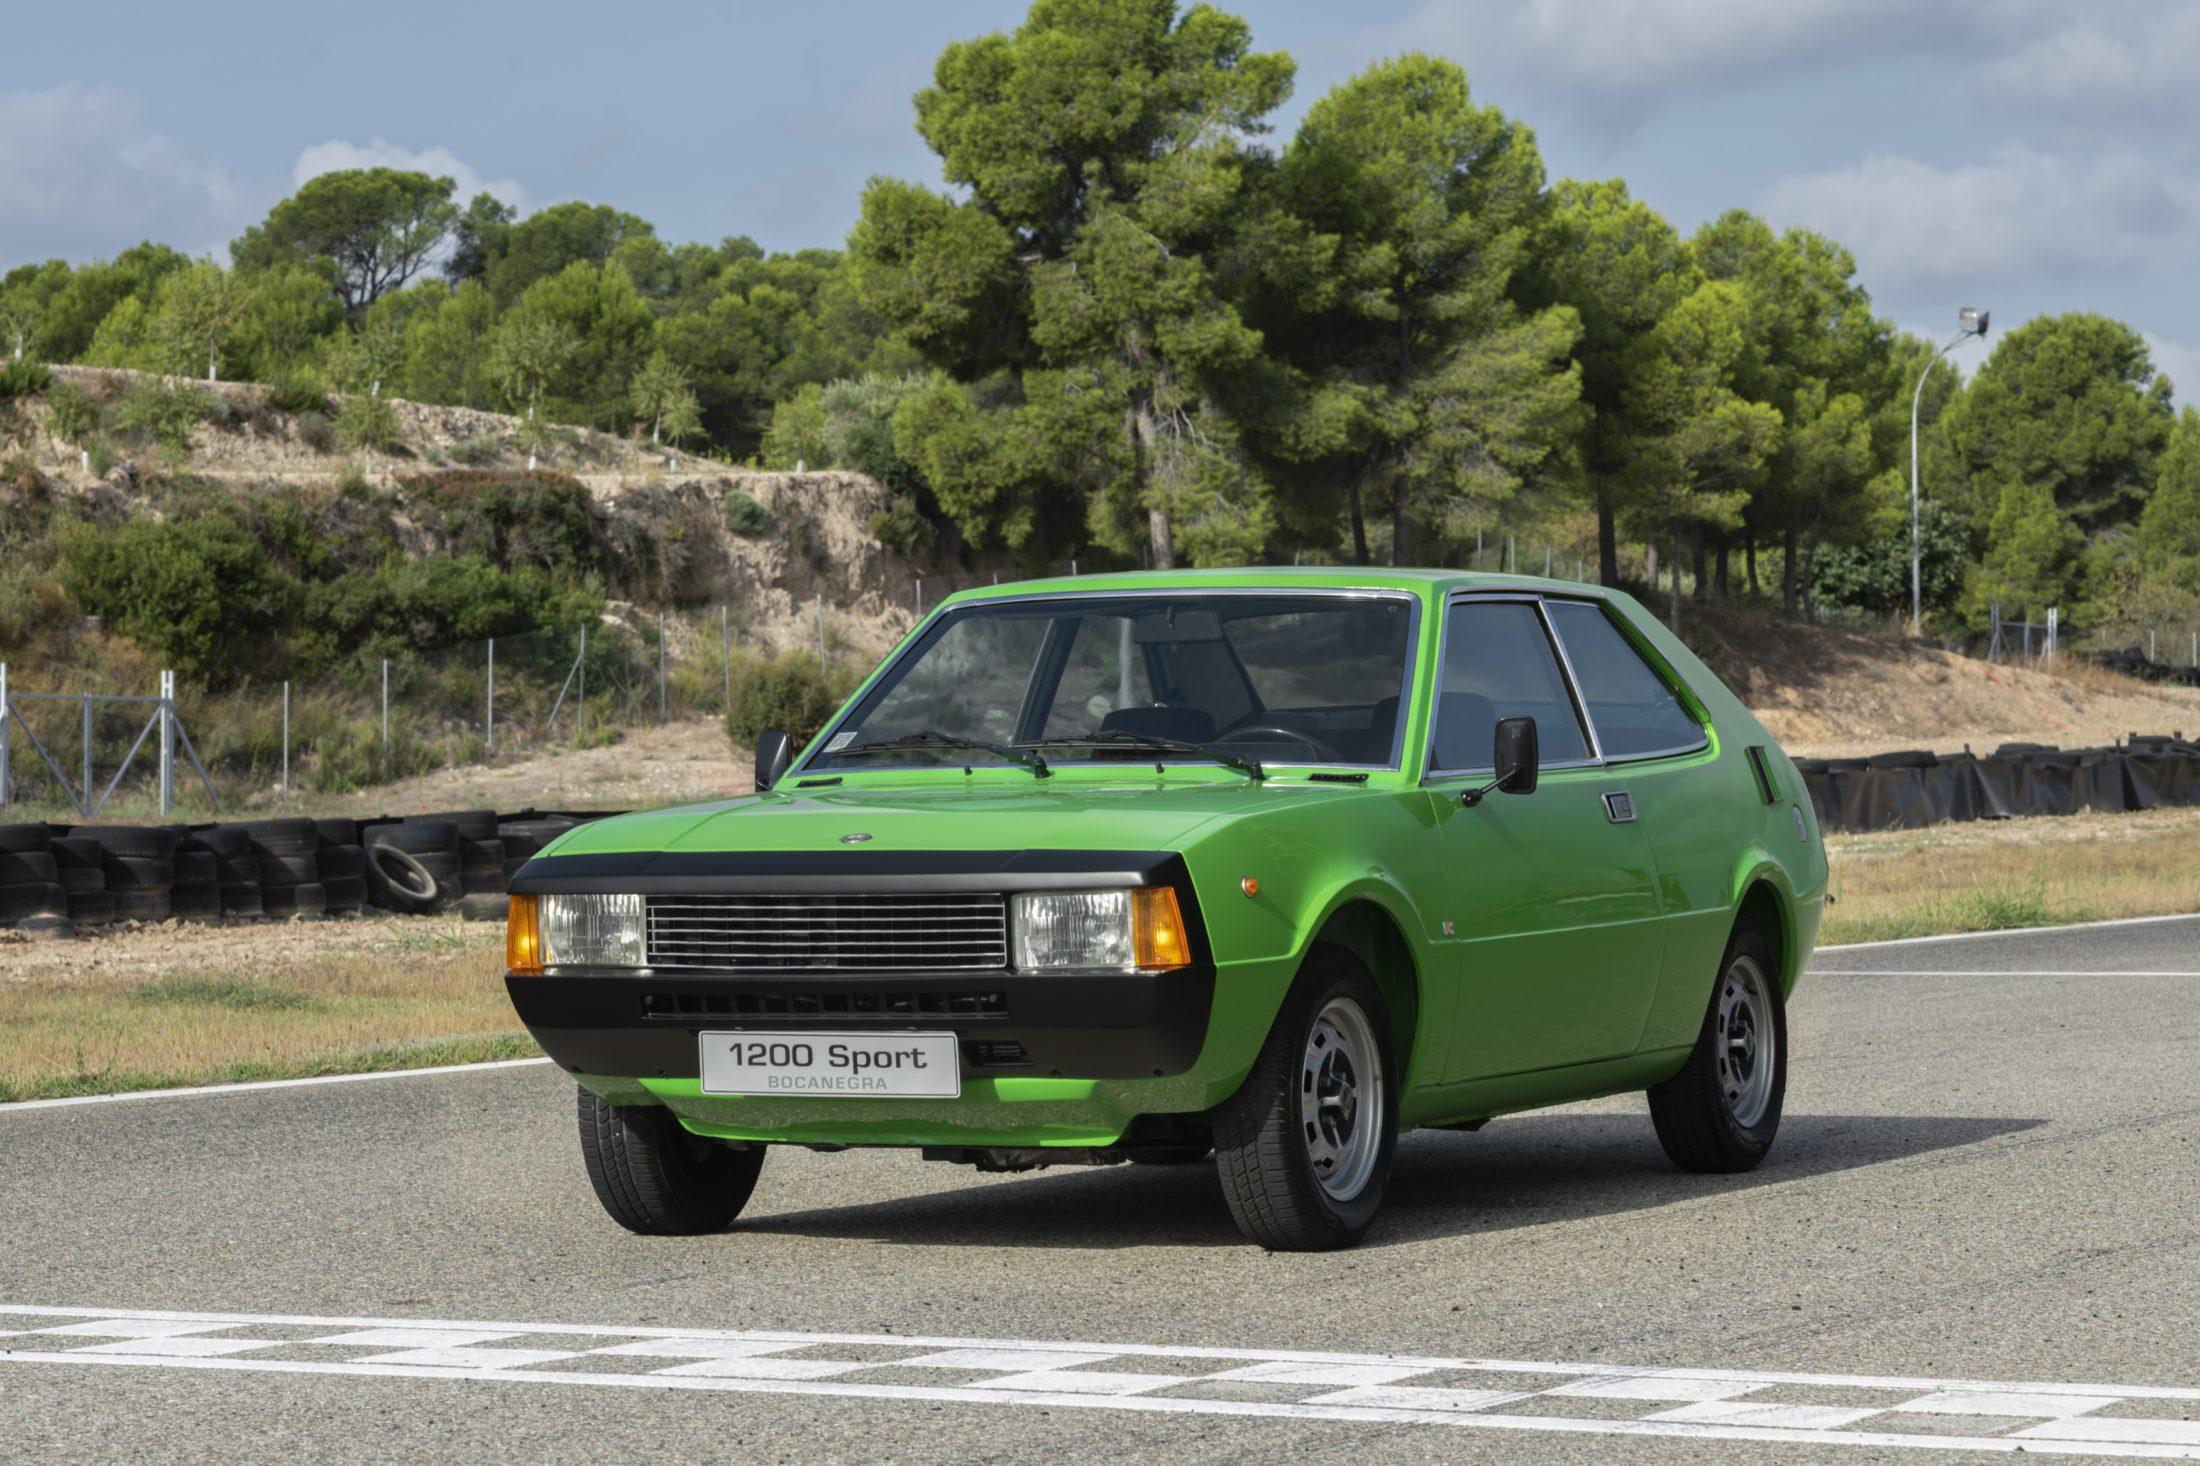 SEAT 1200 Sport